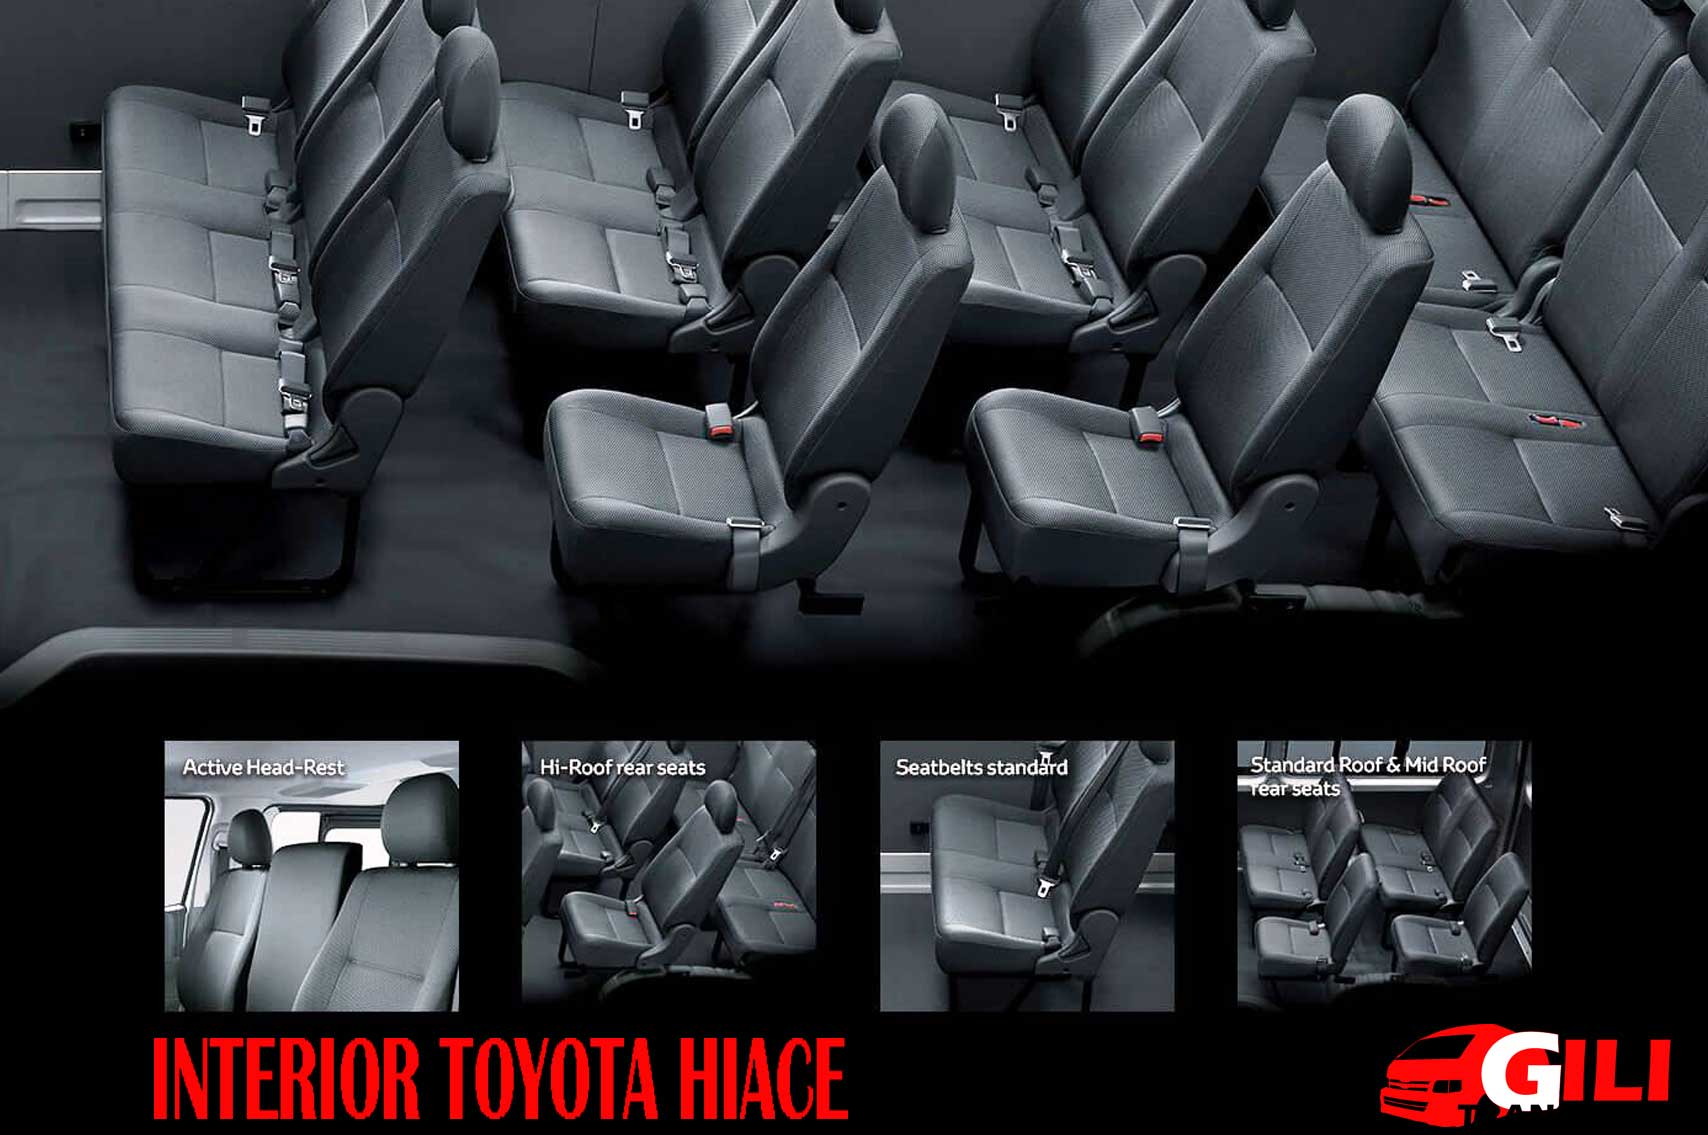 Desain Interior Toyota hiace terbaru